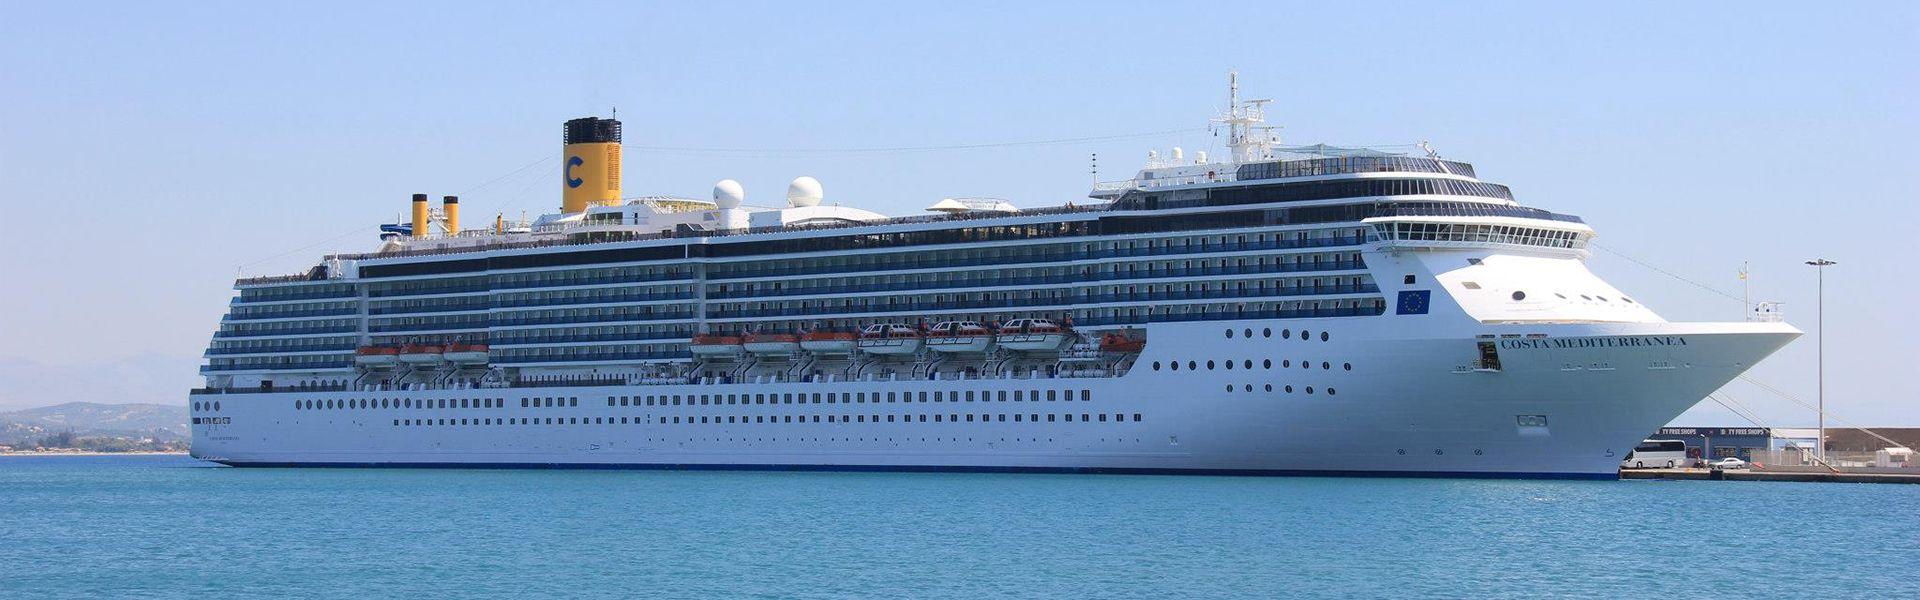 Croaziera 2017 -  Mediterana de Vest (Marsilia) - Costa Cruises - Costa Mediterranea - 3 nopti